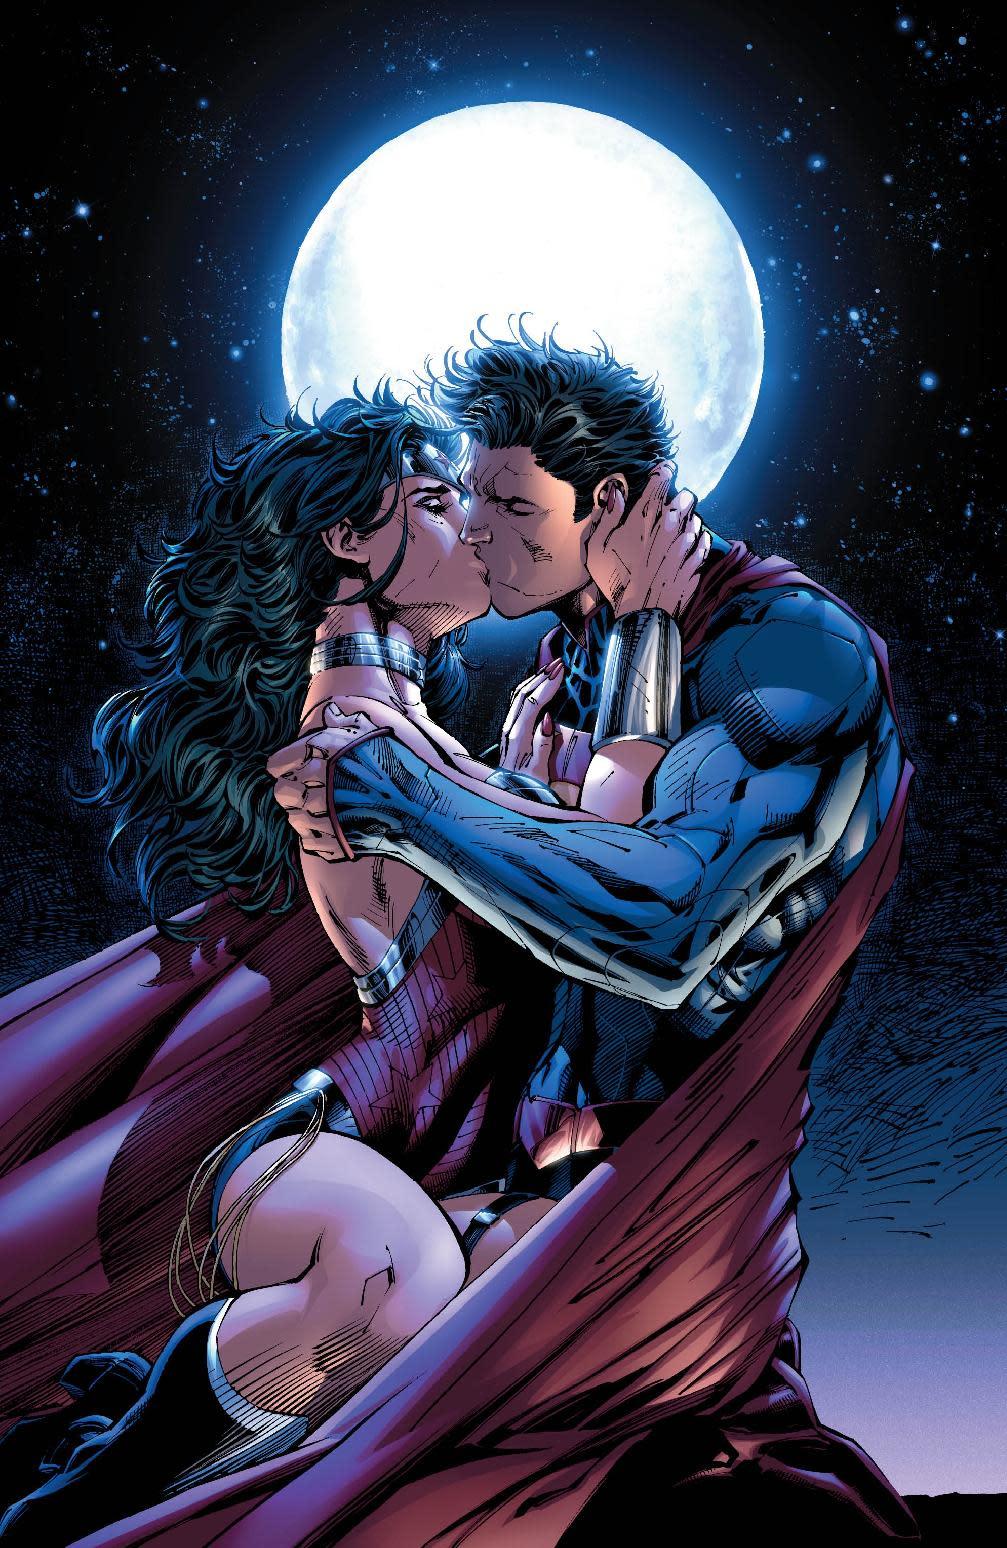 Superman, Wonder Woman lock lips as power couple